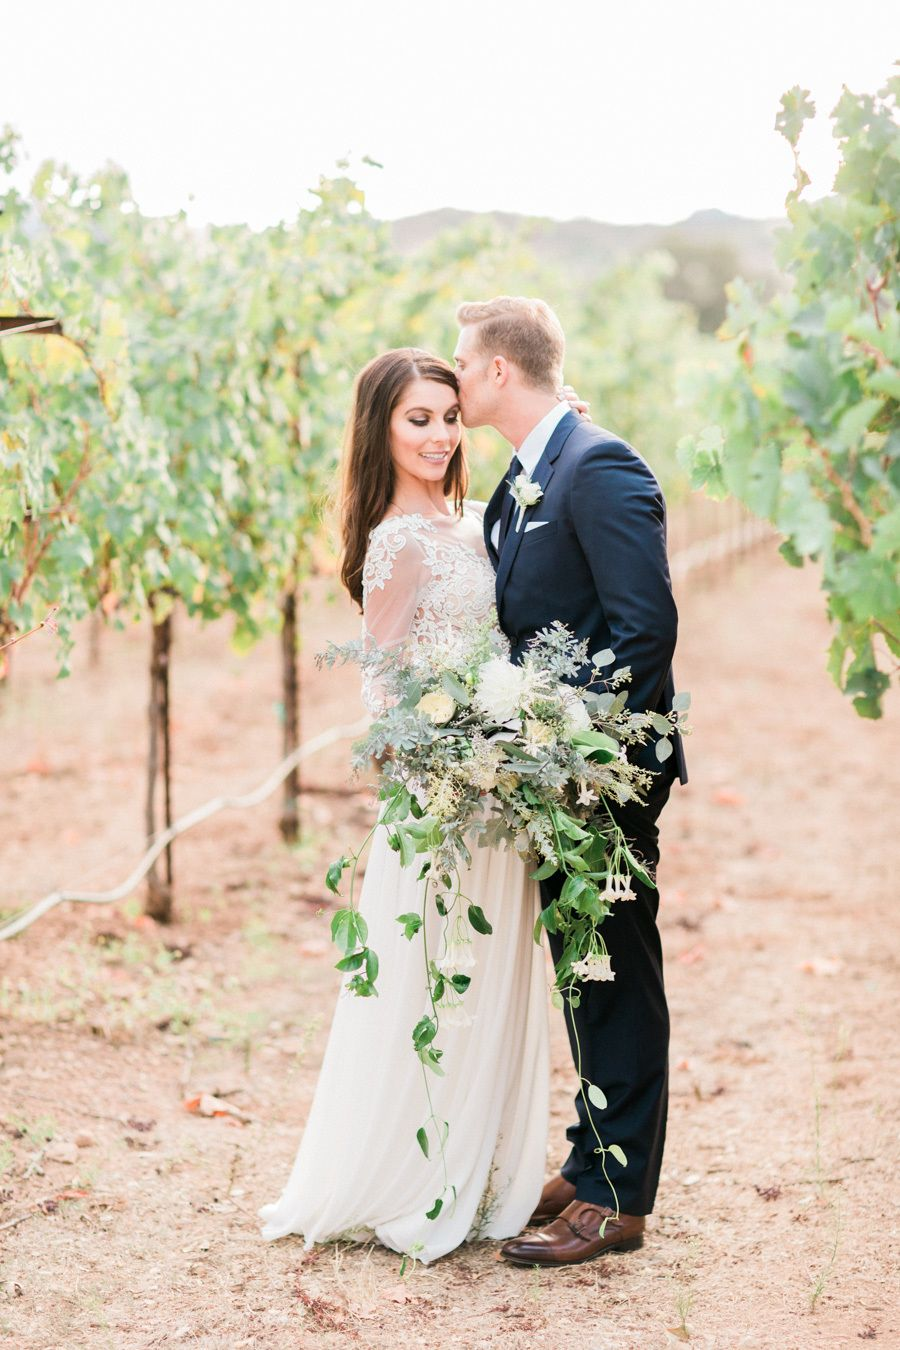 Rustic elegant fall wedding at chateau st jean berta bridal